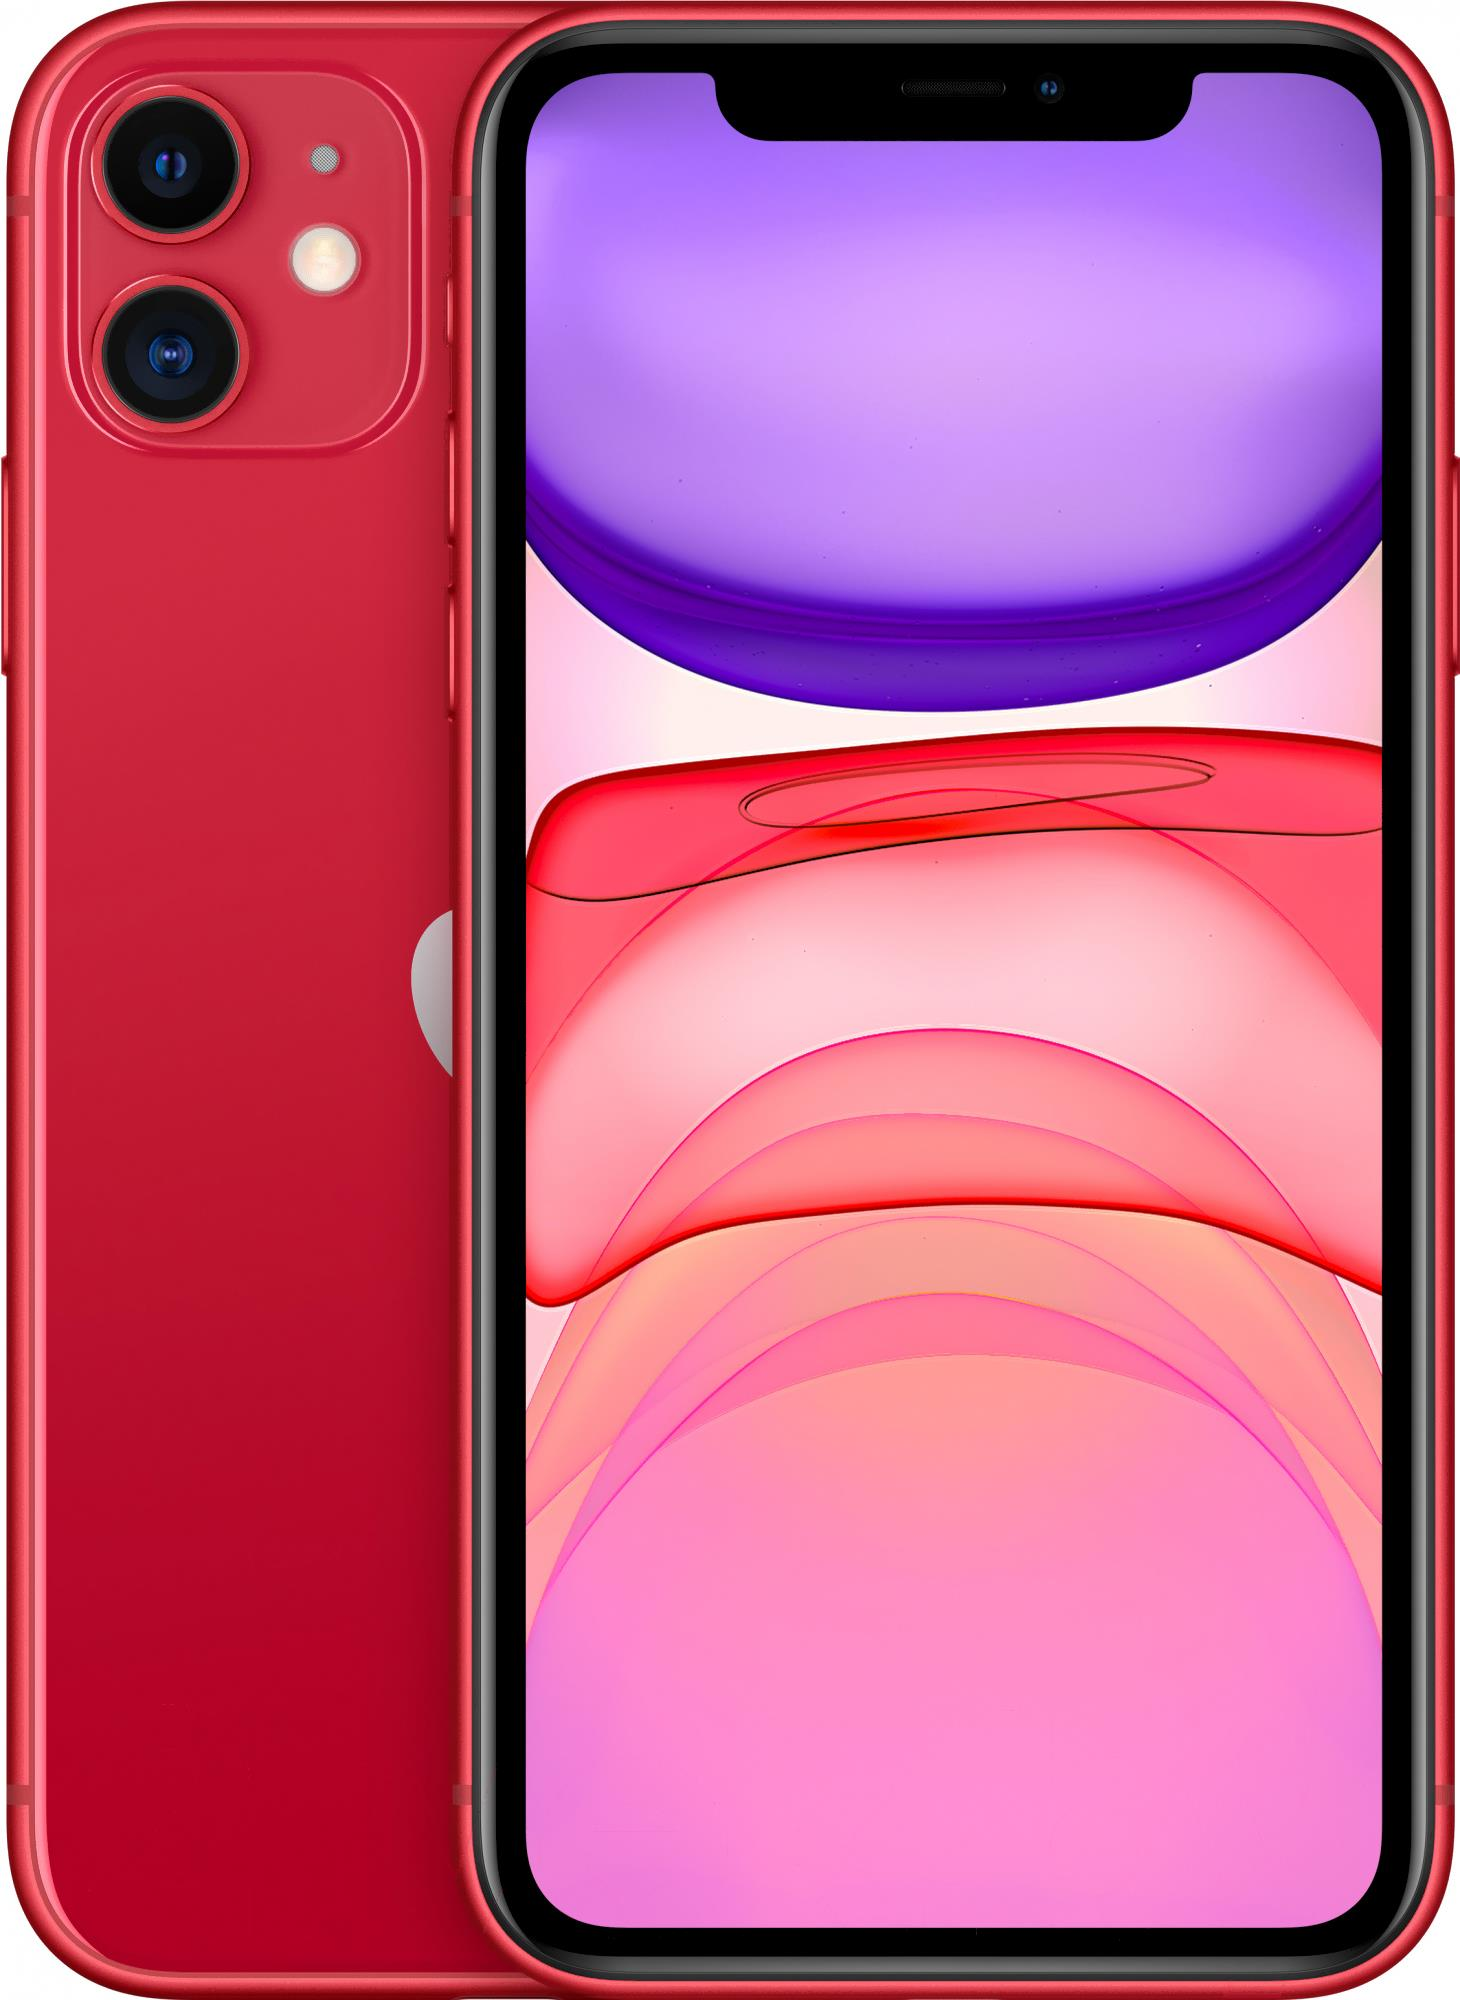 Мобильный телефон Apple iPhone 11 64GB Red [MWLV2]